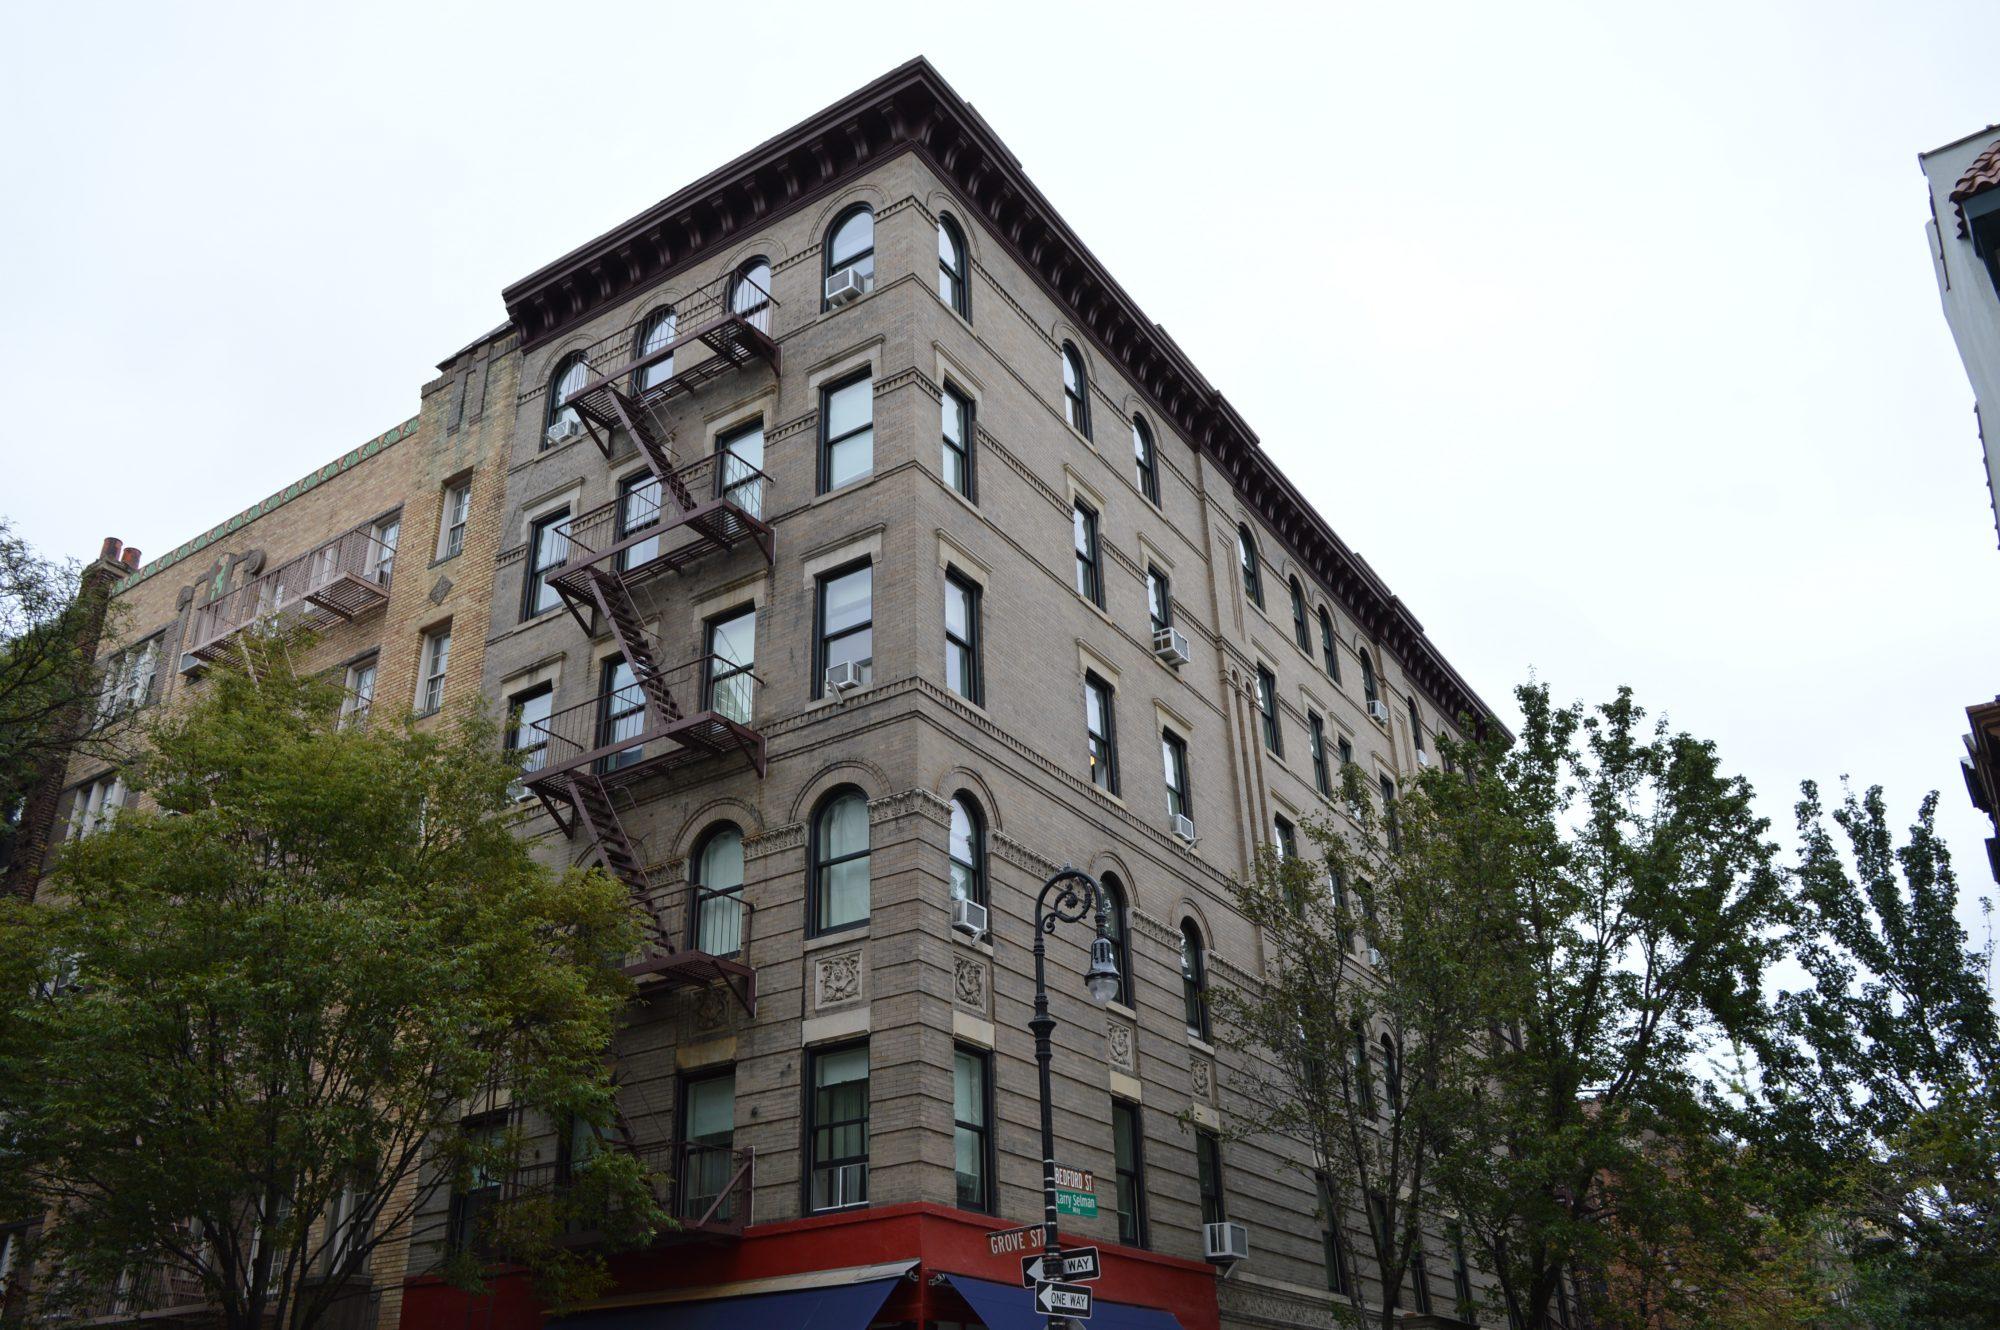 Friends Apartment, New York City